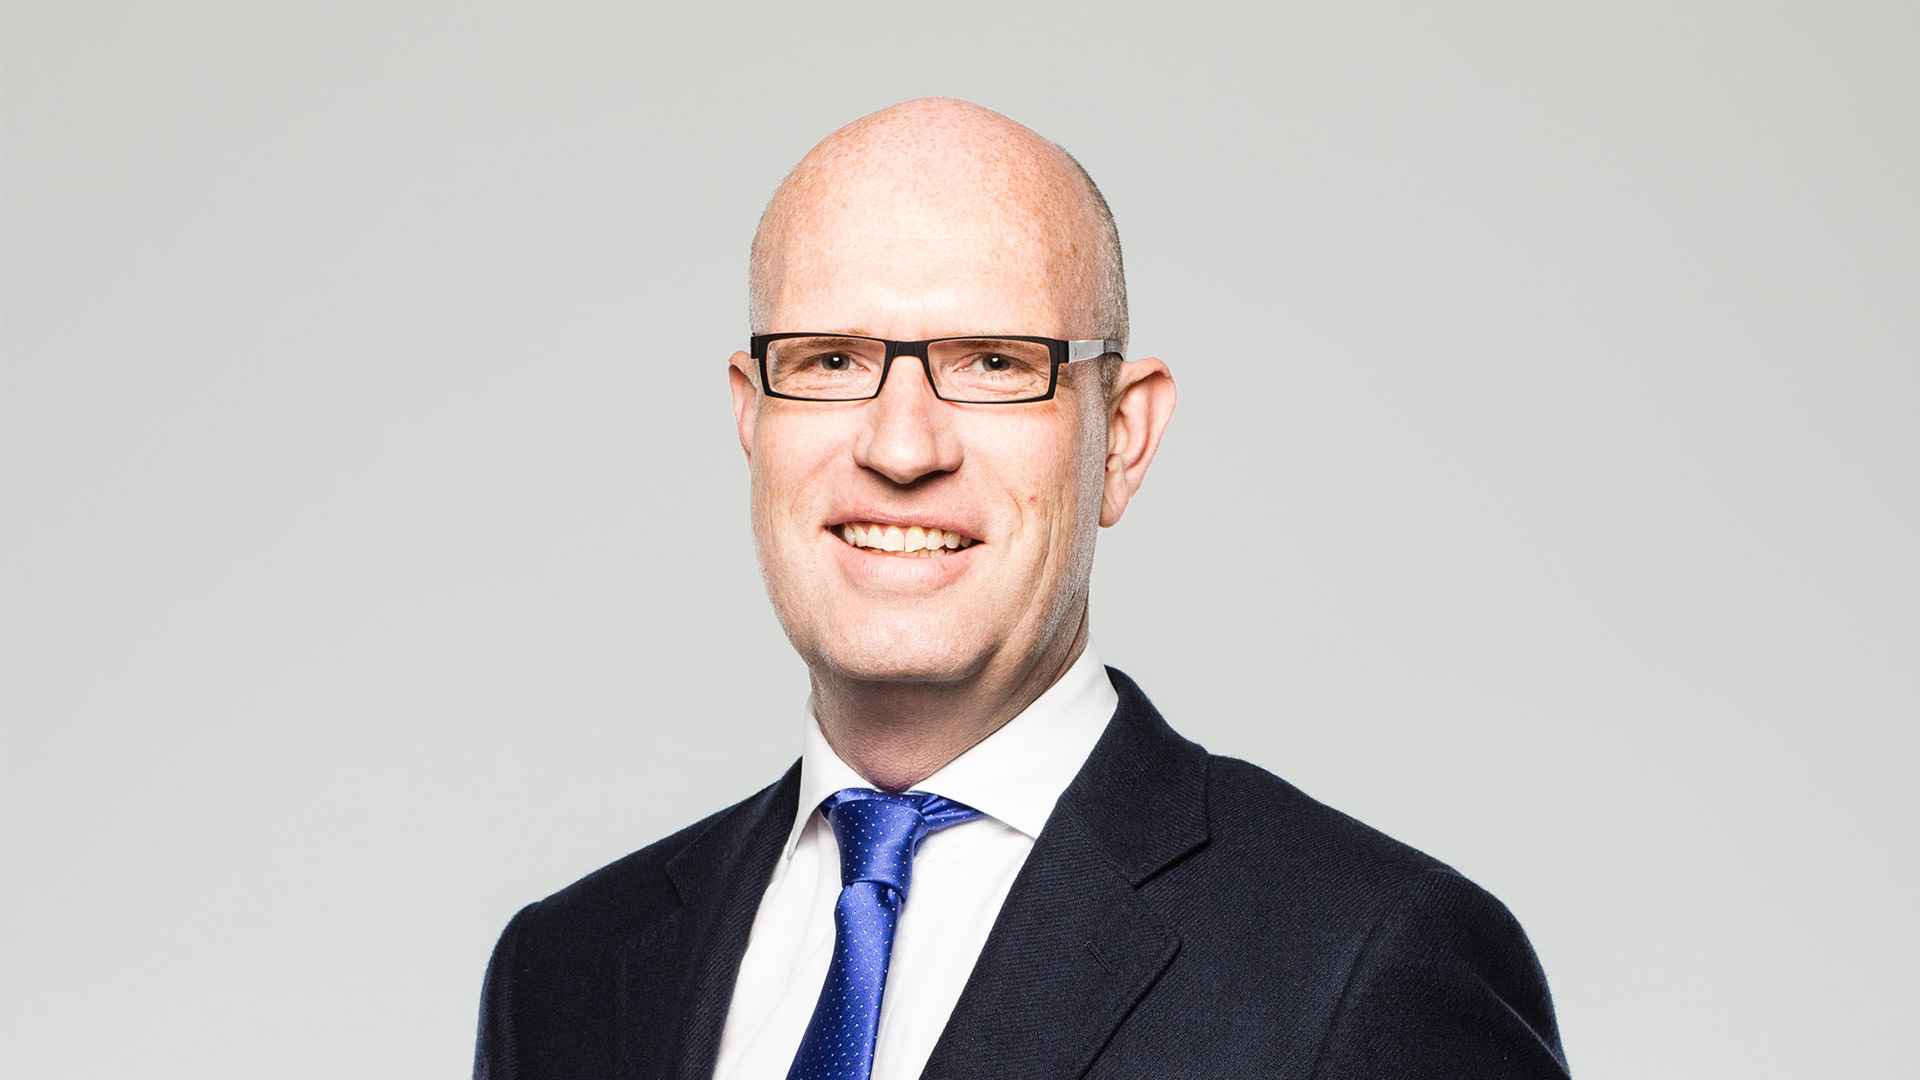 Dirk Filbert